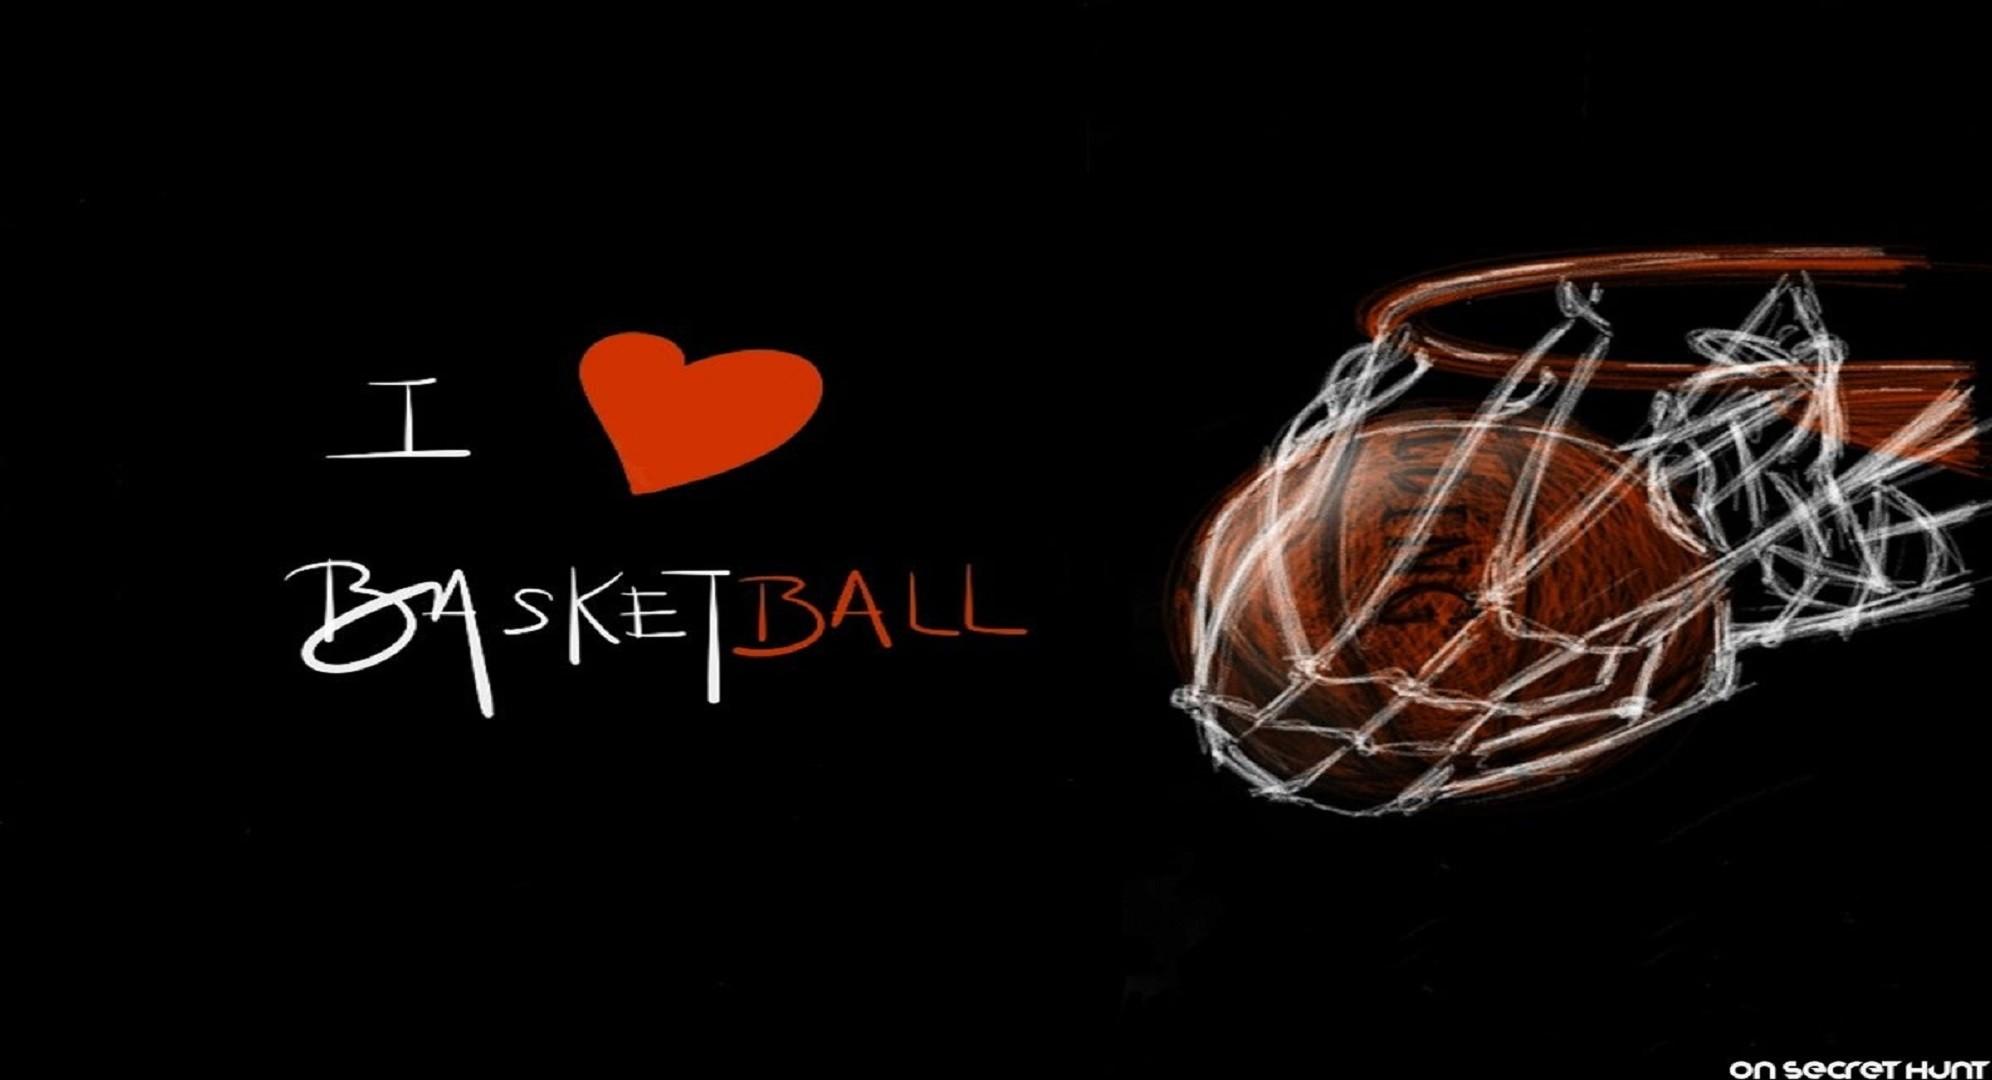 Hd basketball wallpaper 1992x1080 basketball wallpapers basketball voltagebd Images